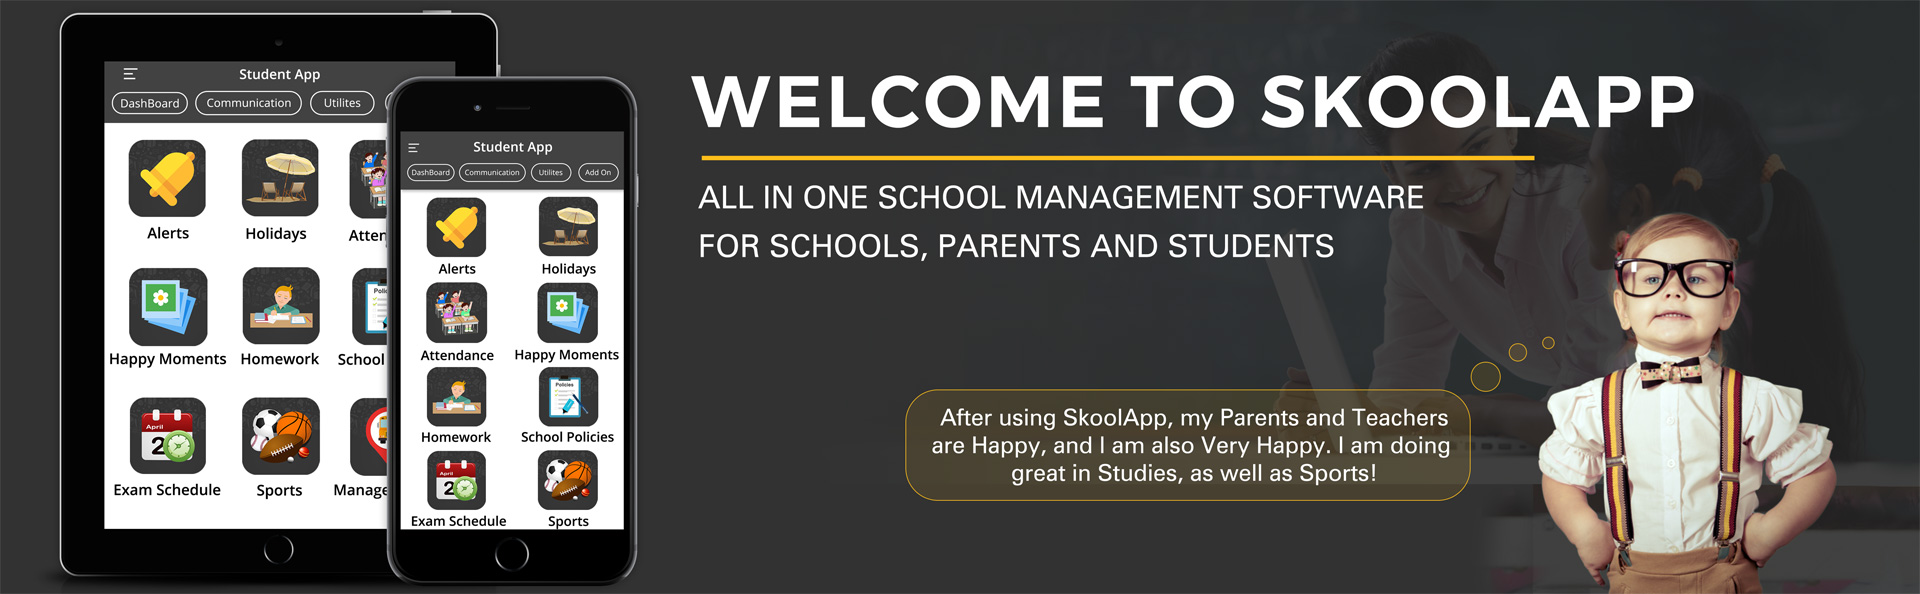 SkoolApp: School Management Software & School Management System